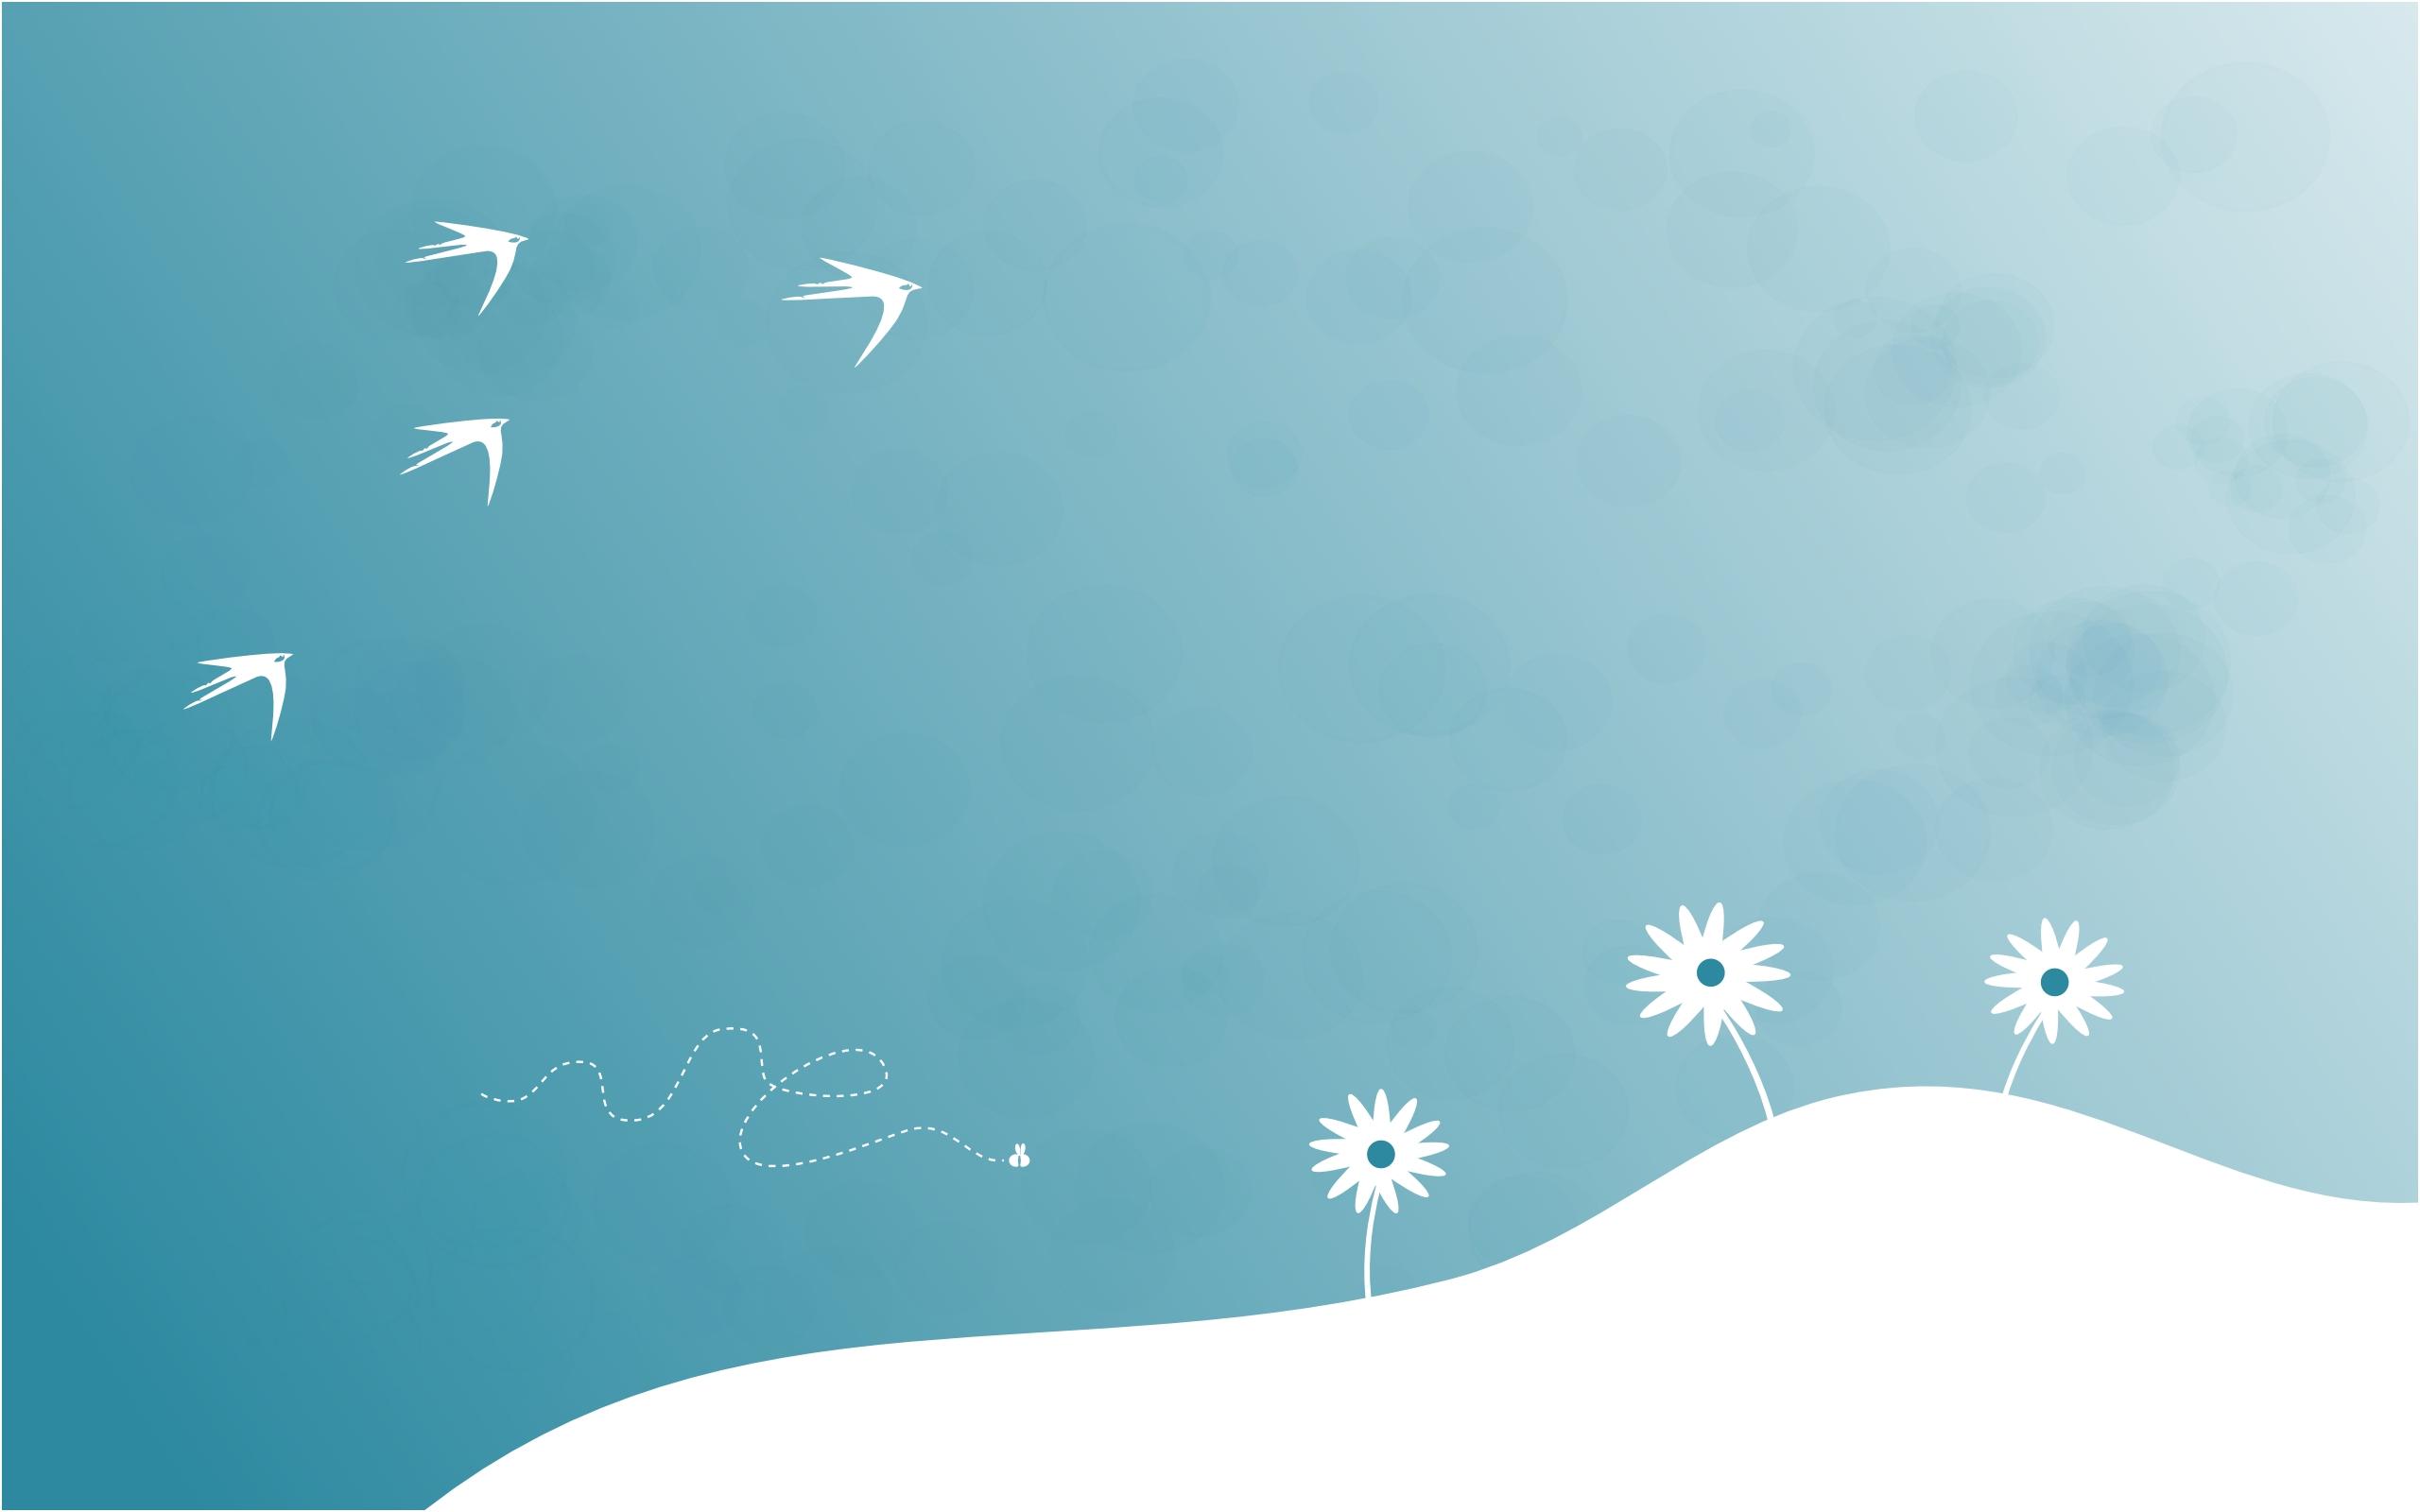 Good Wallpaper Bird Minimalist - bird-nature-minimalism_10750_2560x1600  Collection_461999.jpg